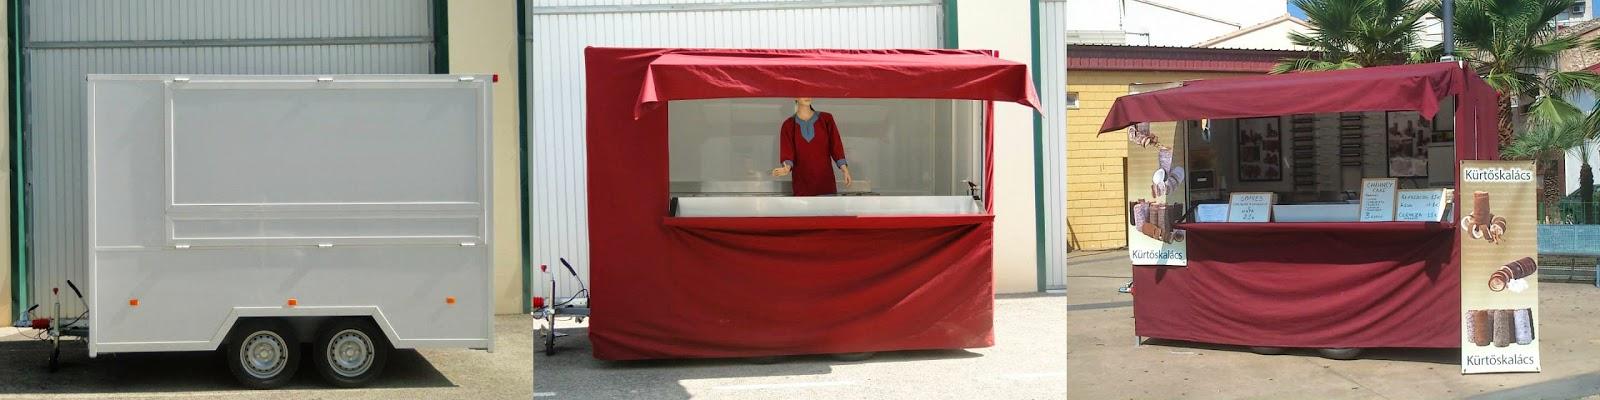 Chimney cake trailer